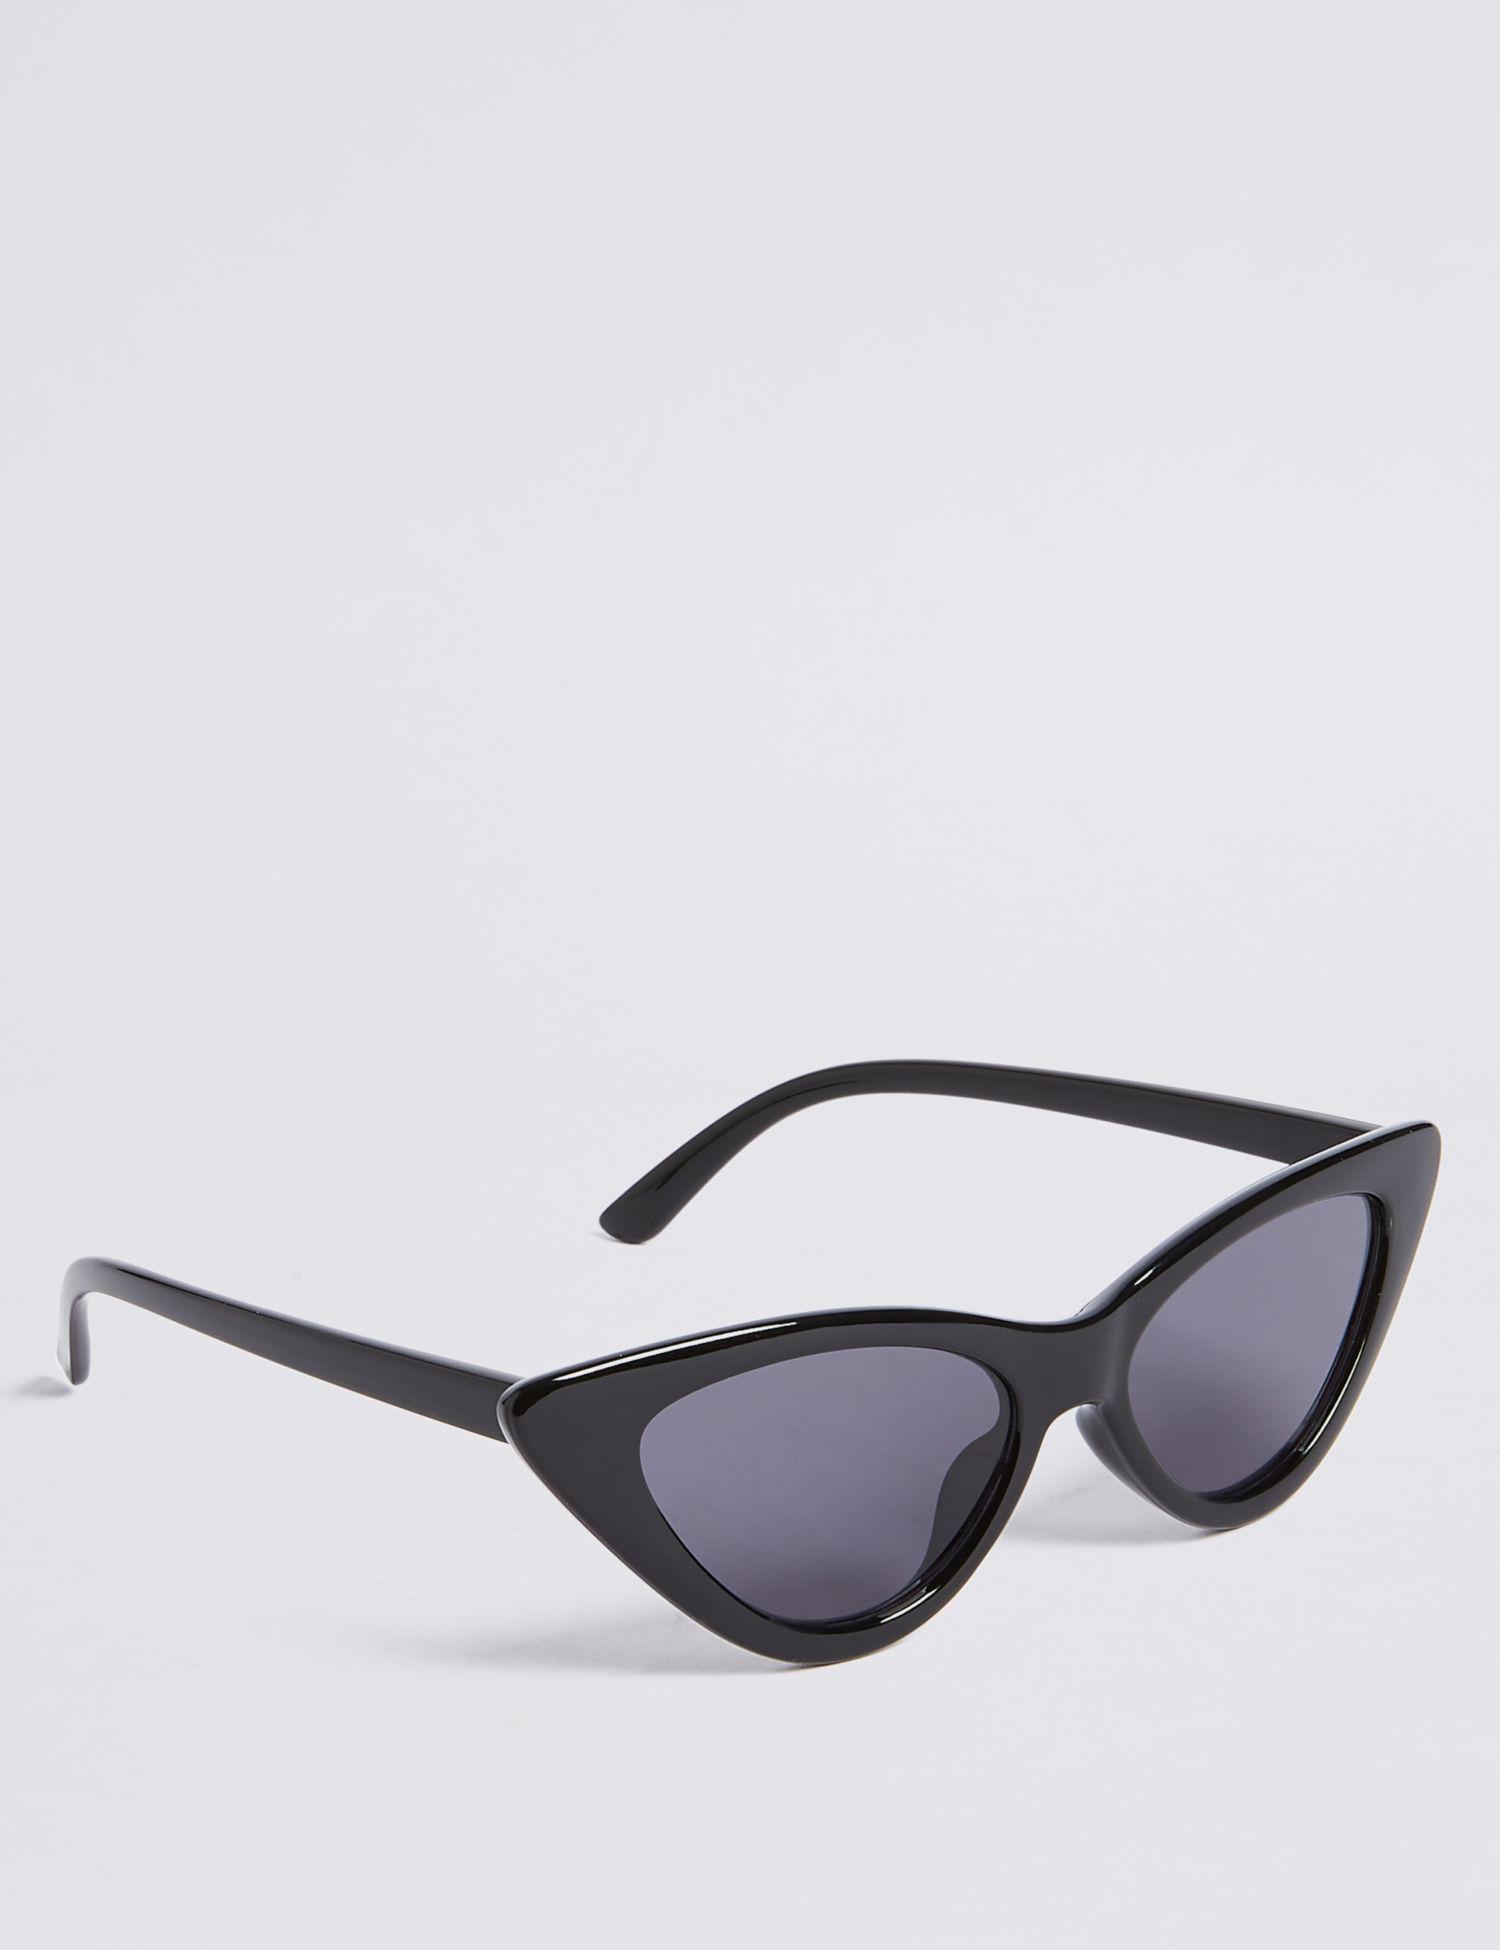 708cba573db Marks   Spencer Narrow Cat Eye Sunglasses in Black - Lyst